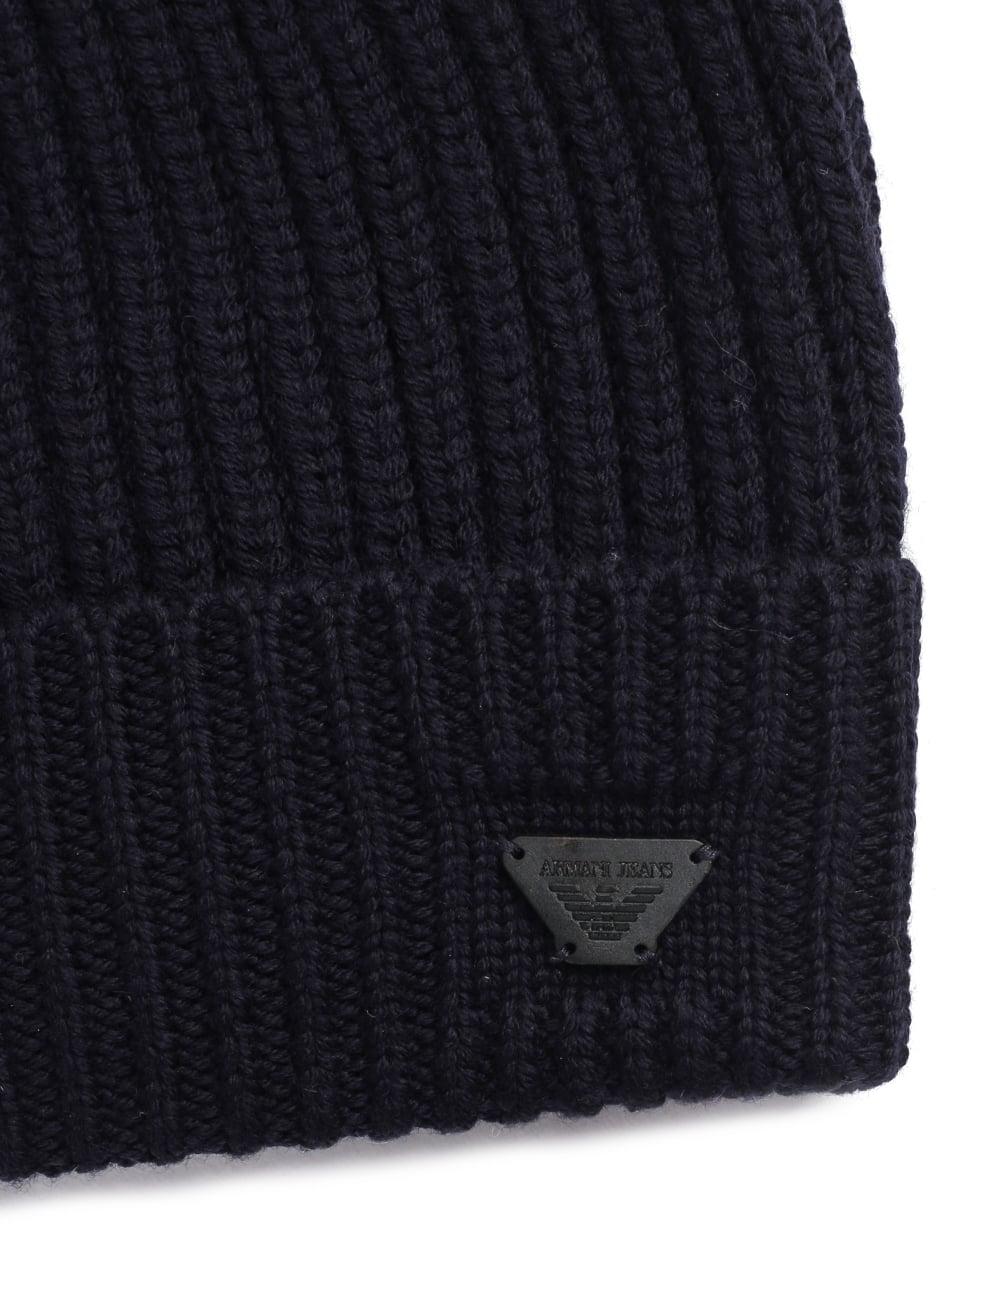 Armani Jeans Men s Beanie Hat ad09600ec81